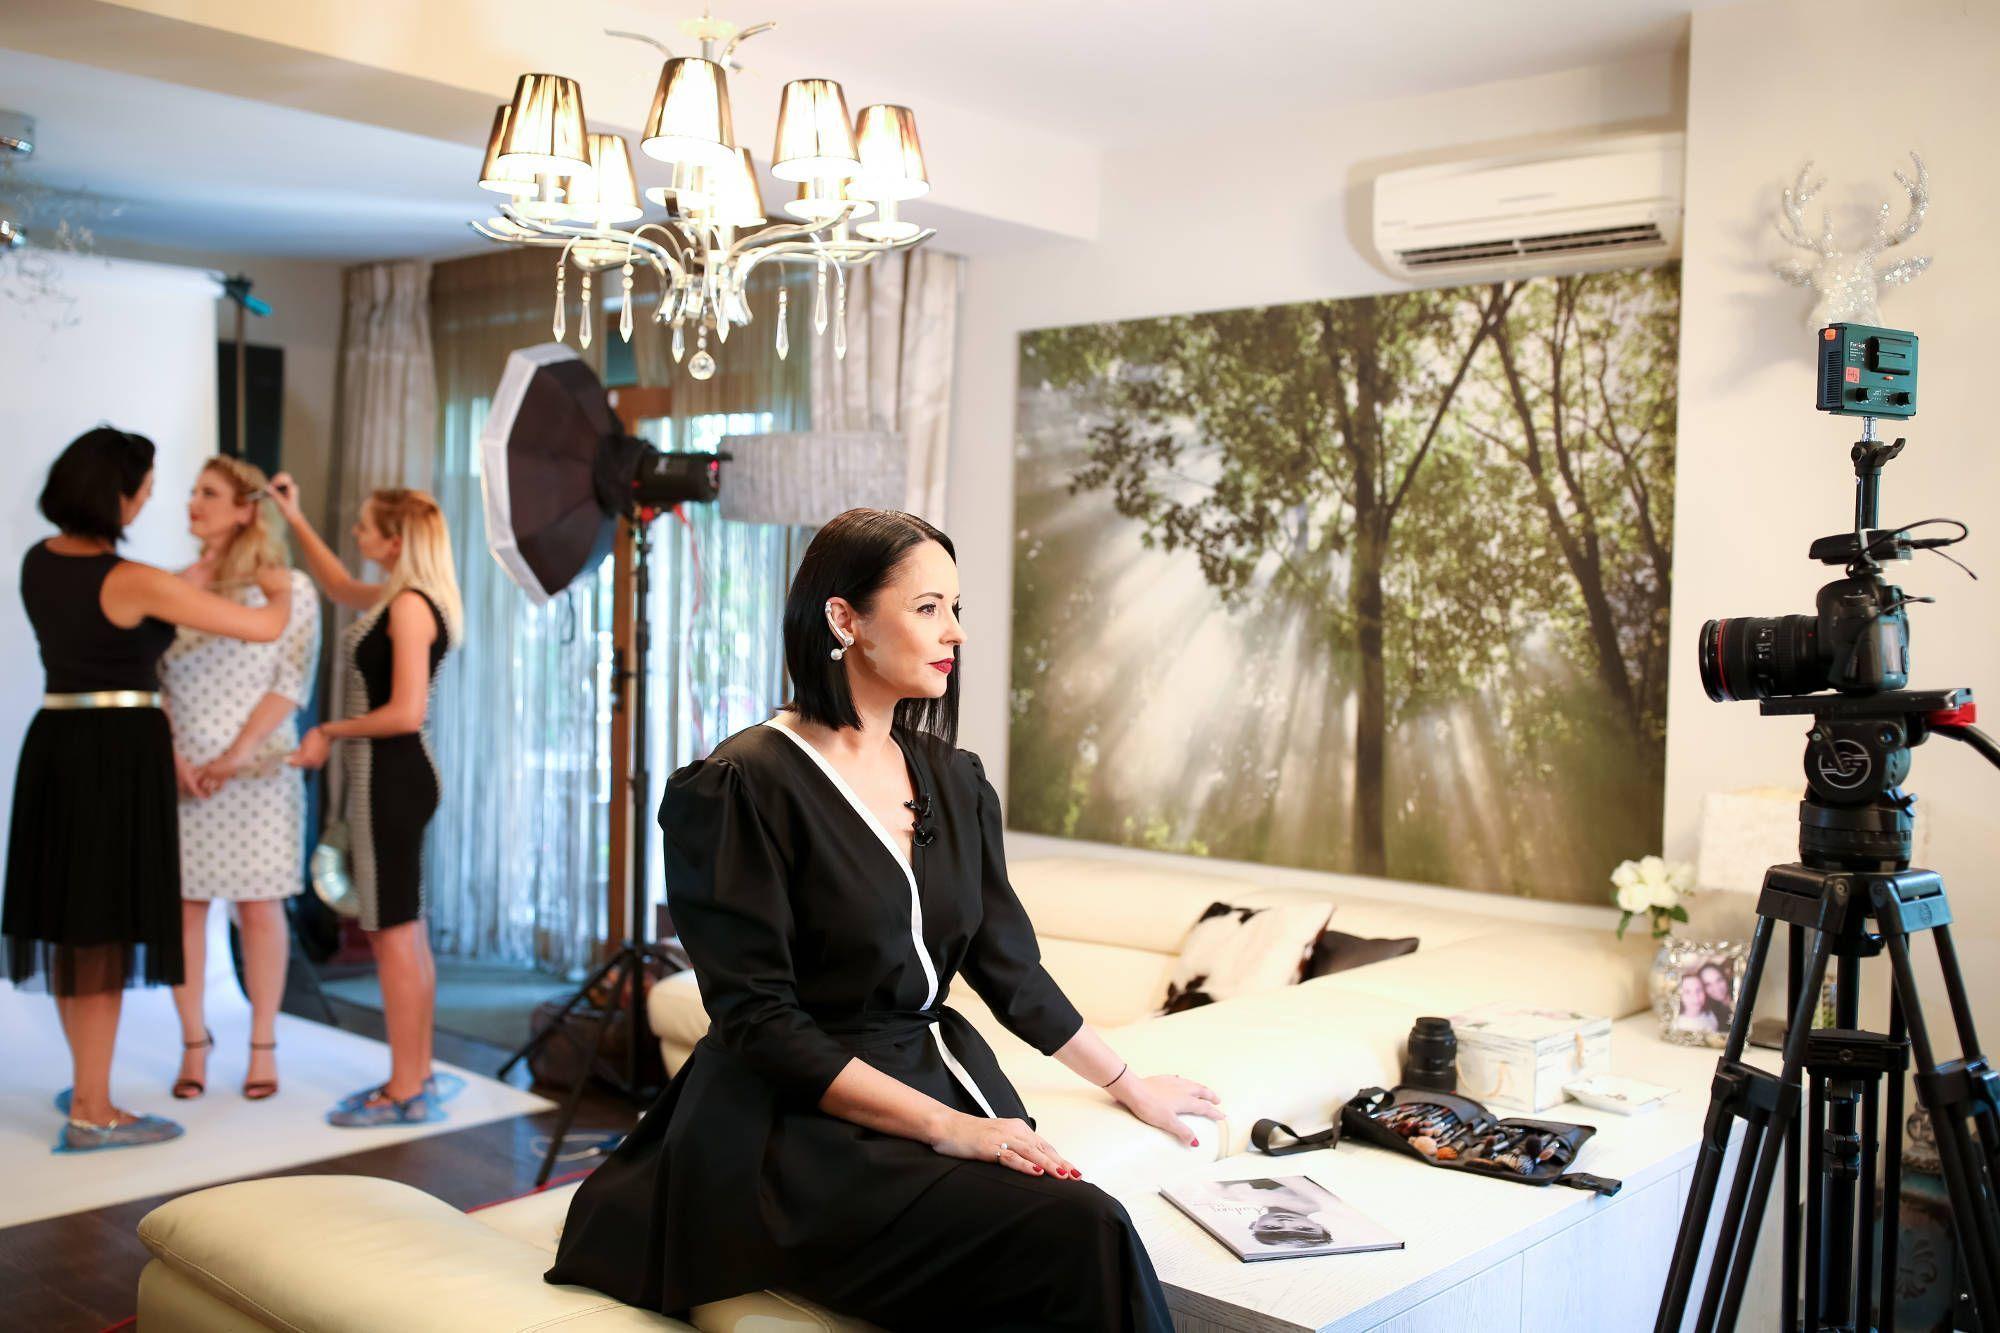 Imagini exclusive de la sedinta foto din casa Andreei Marin